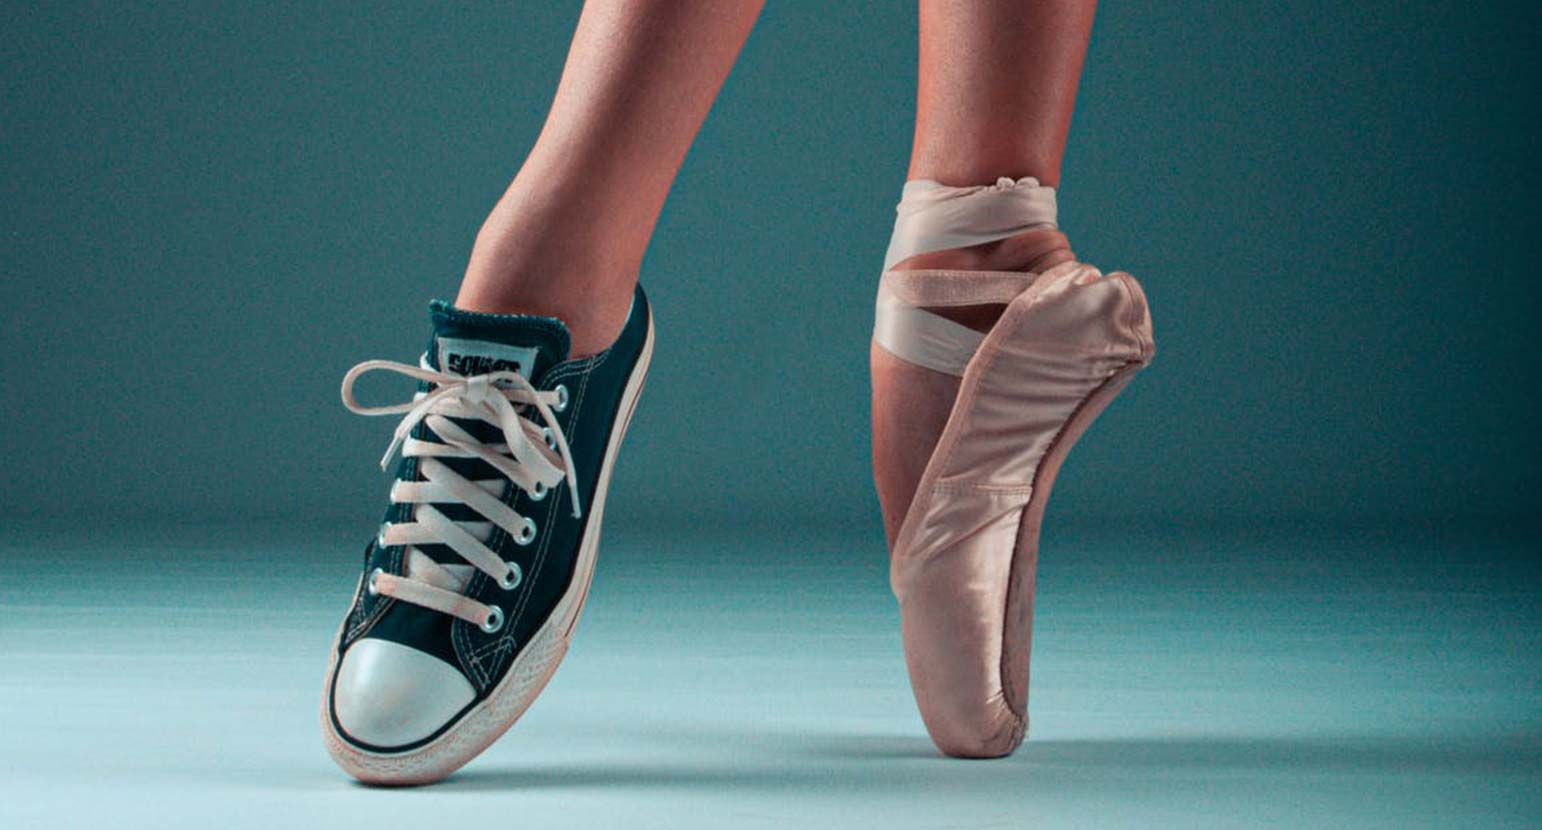 Ballerina and Grunge - personalisation